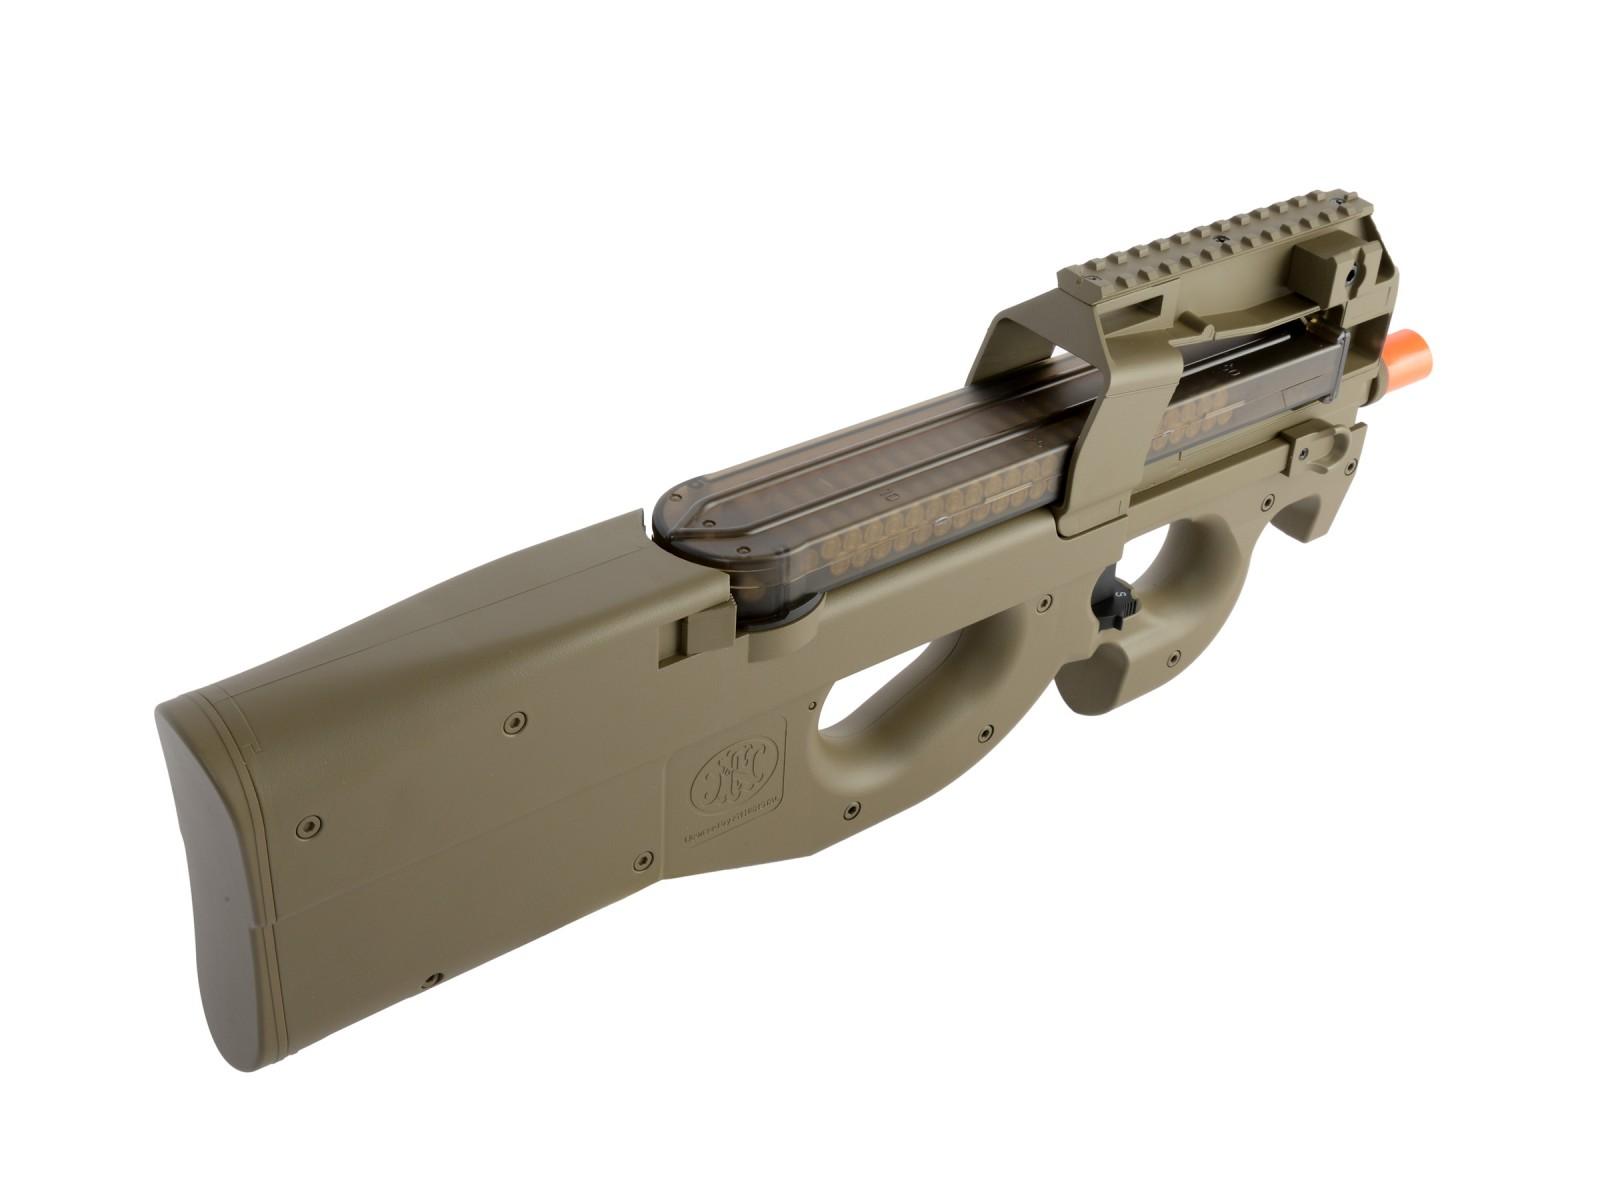 p90 machine gun sale